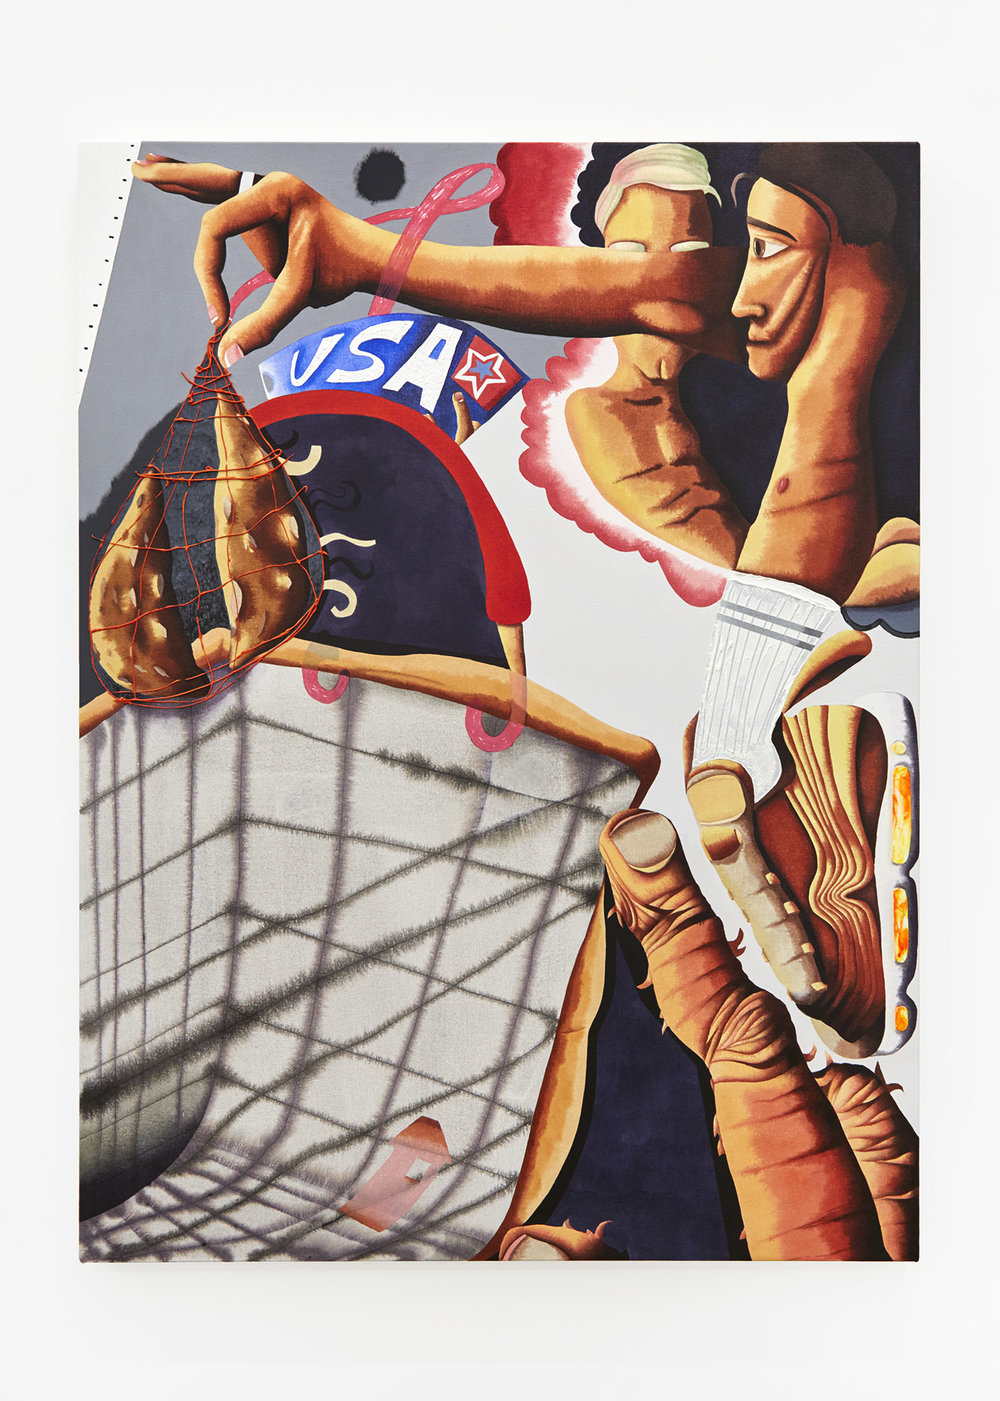 Shopping Acrylic on canvas 100 x 75cm, 2018